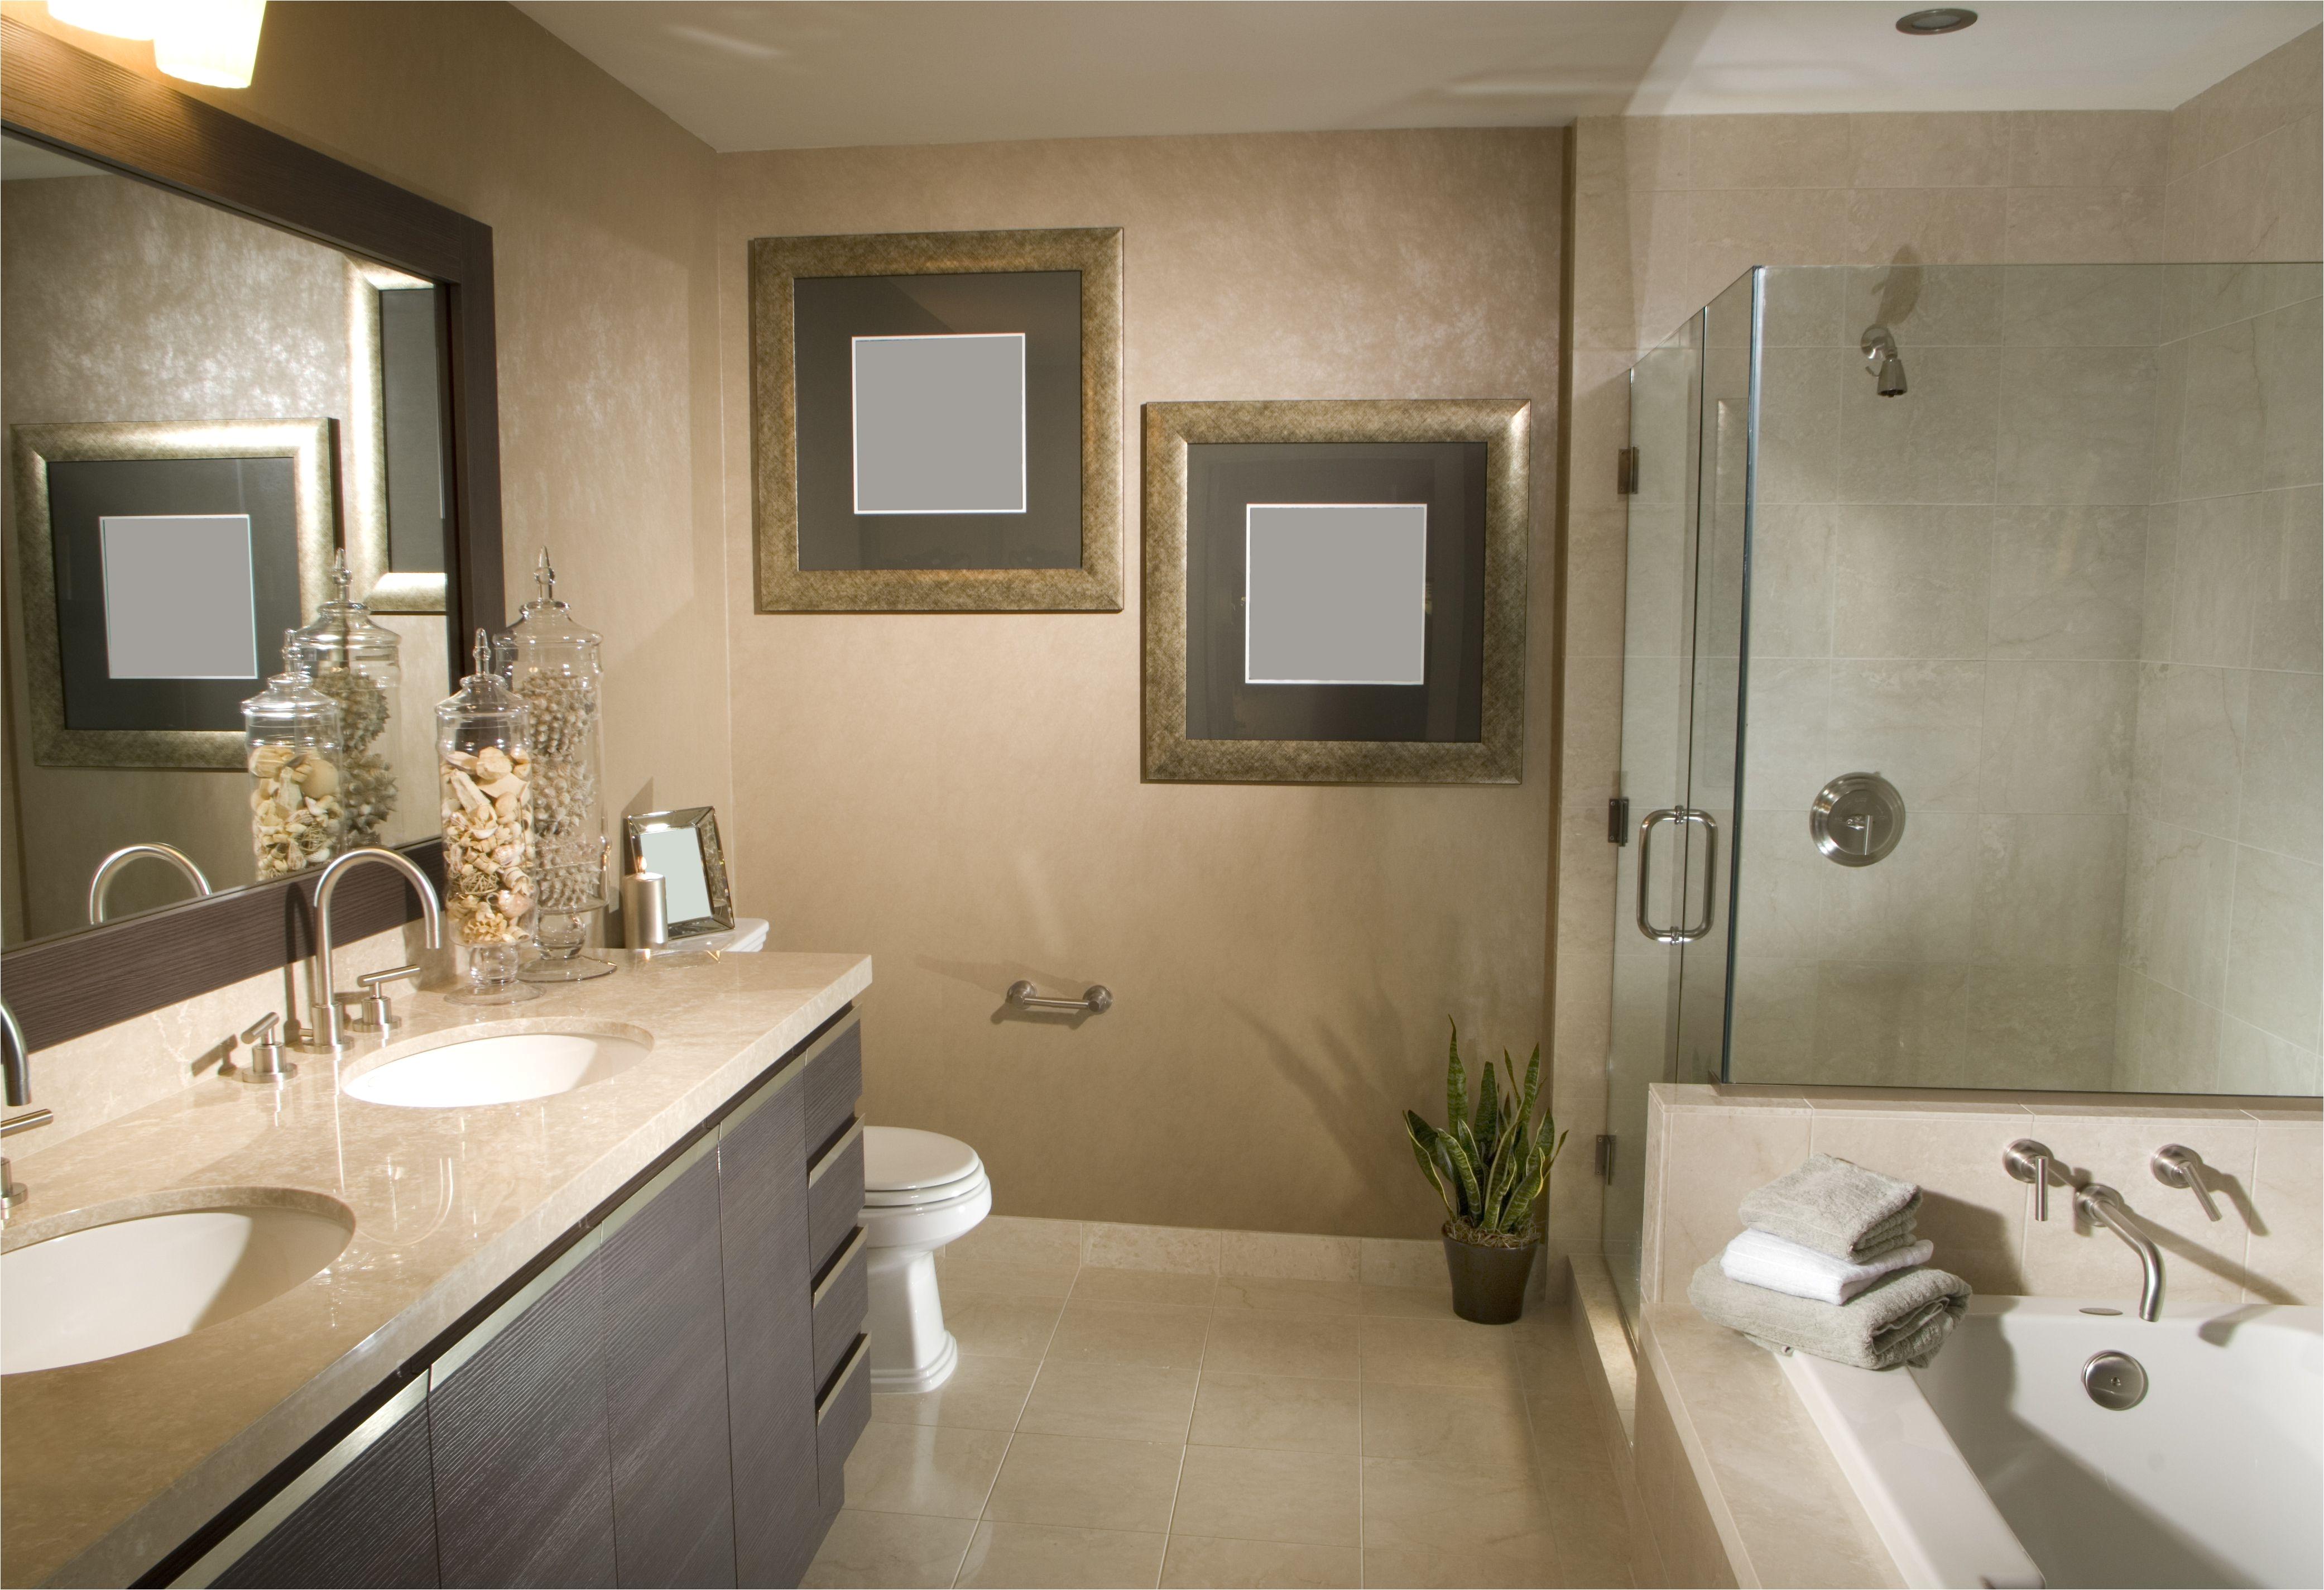 architecture stock bath room design photo images 171159076 57f121703df78c690f9d37a8